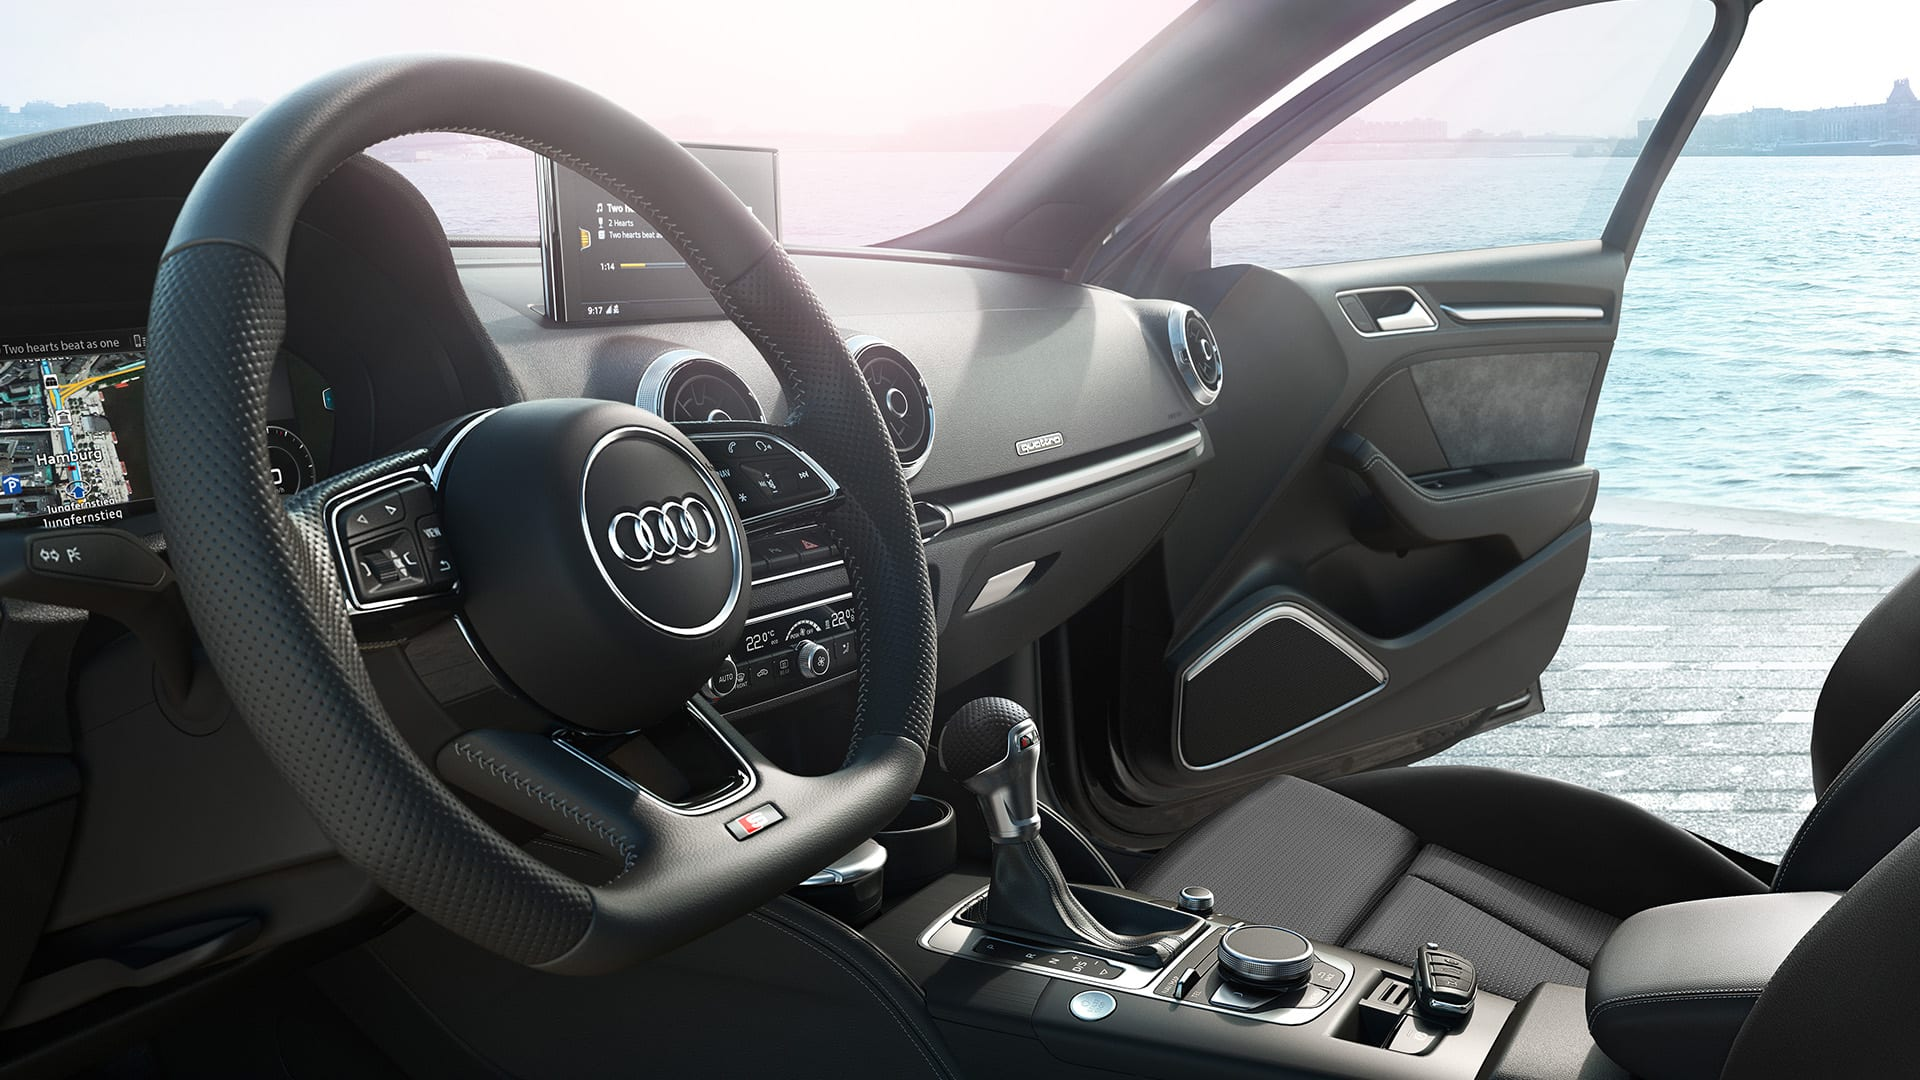 A3 Sedan A3 Audi India